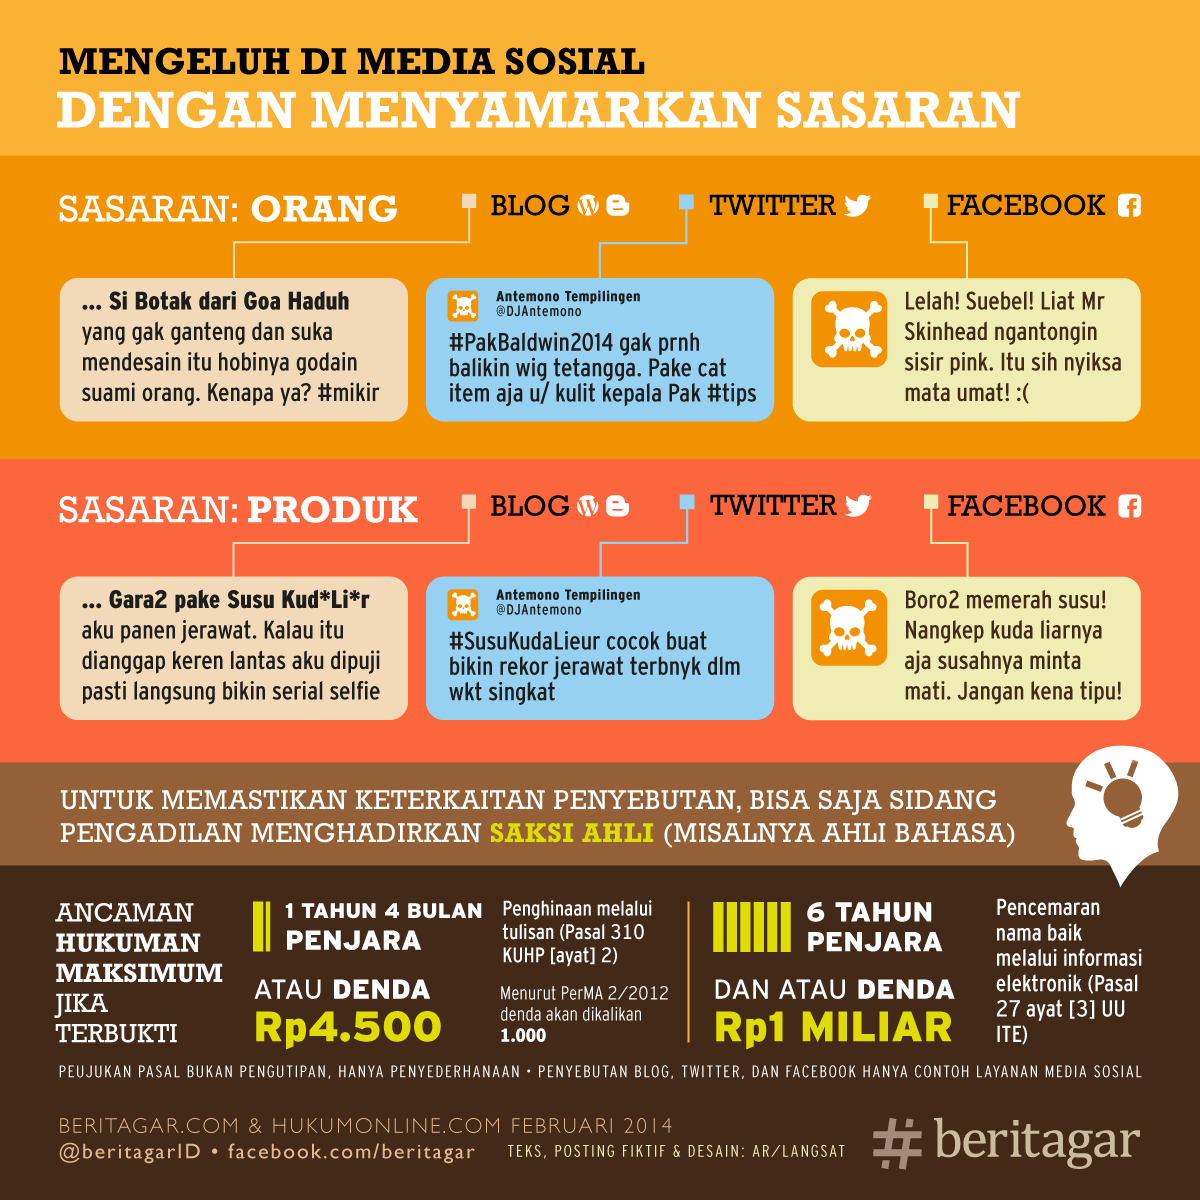 Nih! --> Amankah menyamarkan nama sasaran di media sosial? http://t.co/v7JQPRQsrJ